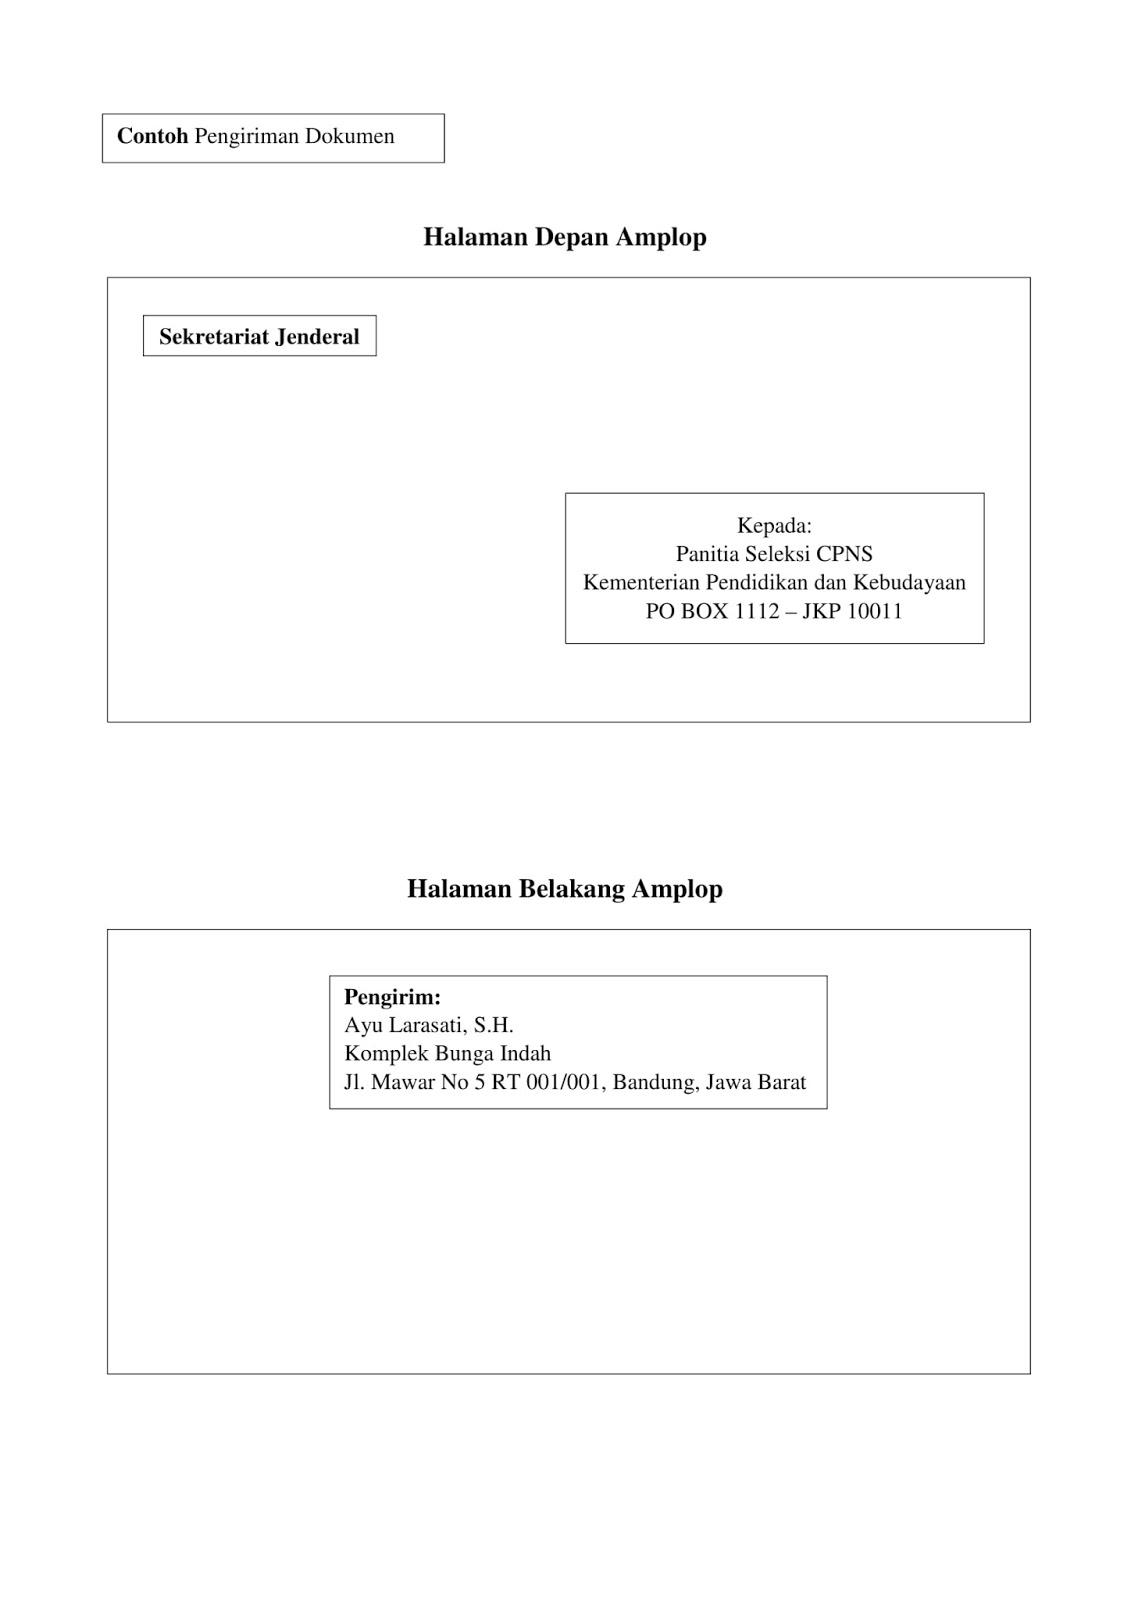 Contoh Terbaru Surat Lamaran CPNS Kemendikbud Tahun  Contoh Terbaru Surat Lamaran CPNS Kemendikbud Tahun 2018 [Beserta Cara Pengiriman Berkas]